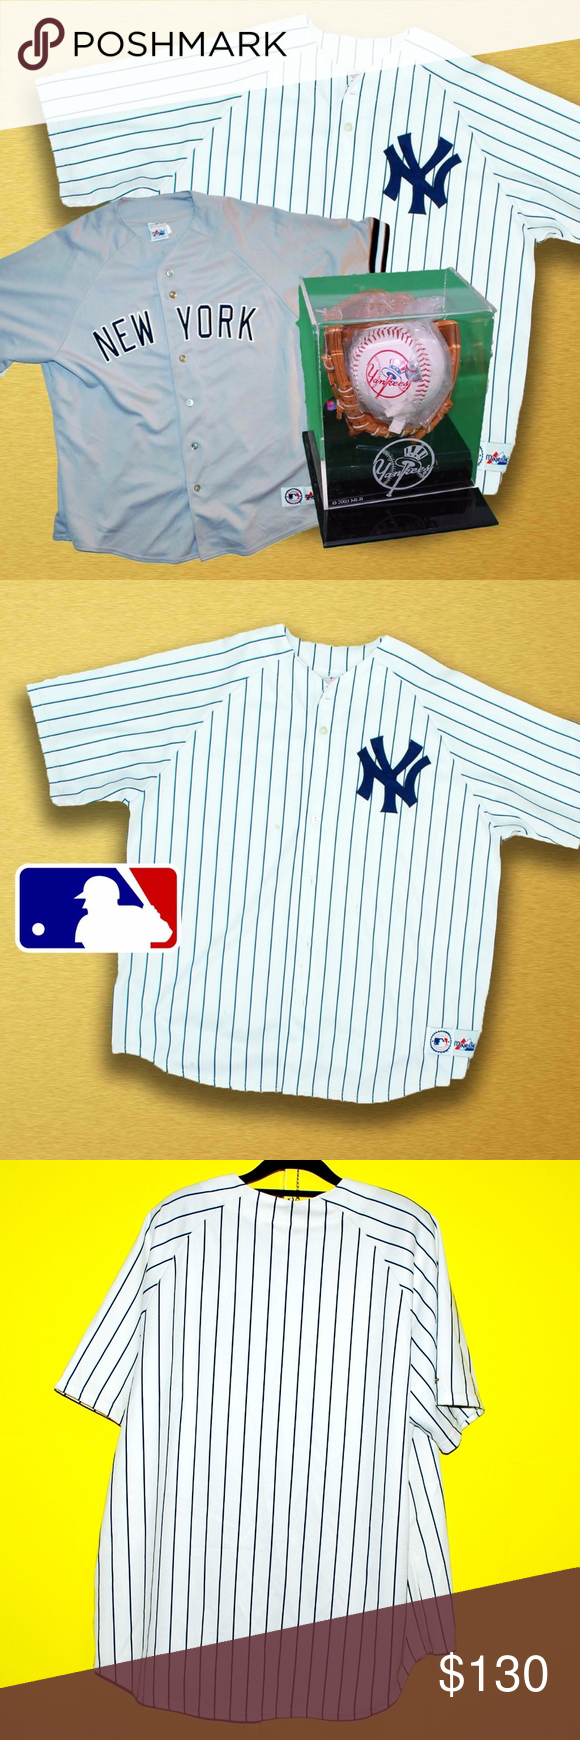 Yankees Bundle Home Away Jersey Display Case Jersey Display Case Jersey Display Red Sox Jersey